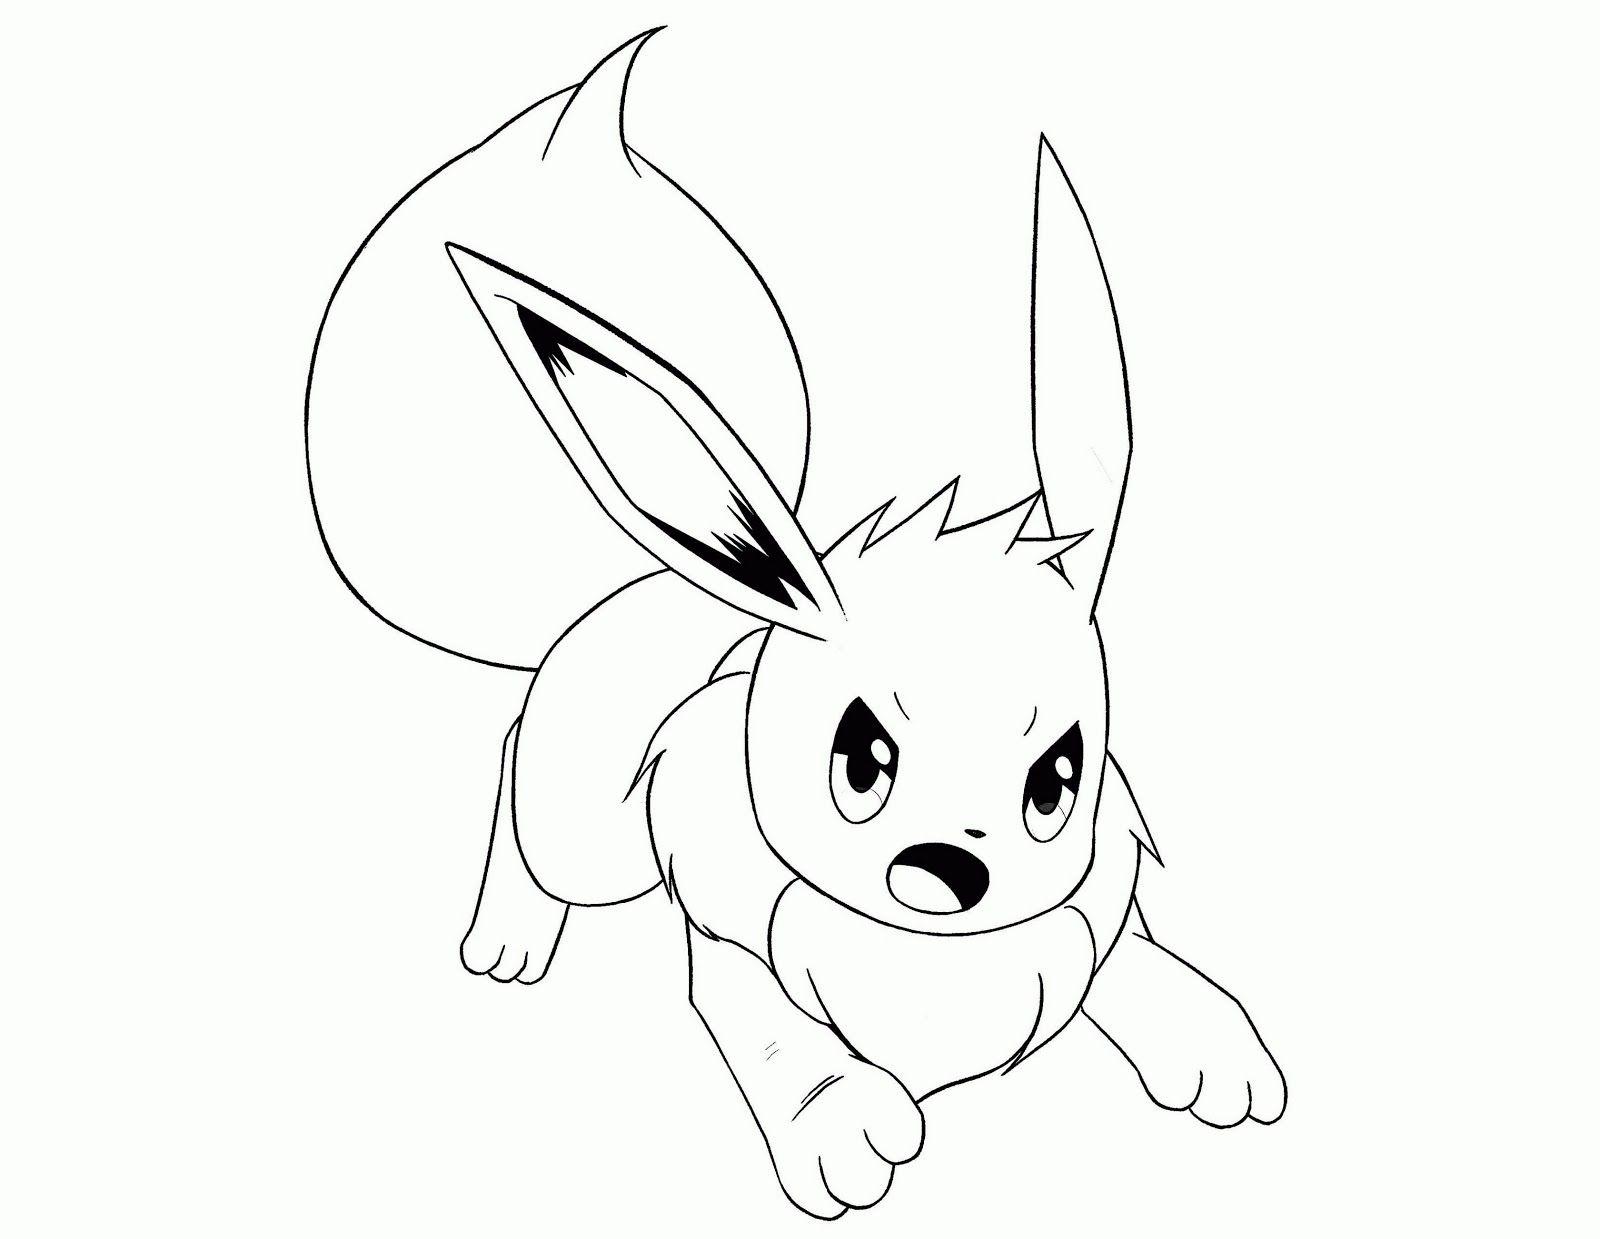 Eevee Pokemon Coloring Sheet Pokemon Coloring Pages Pokemon Coloring Cartoon Coloring Pages